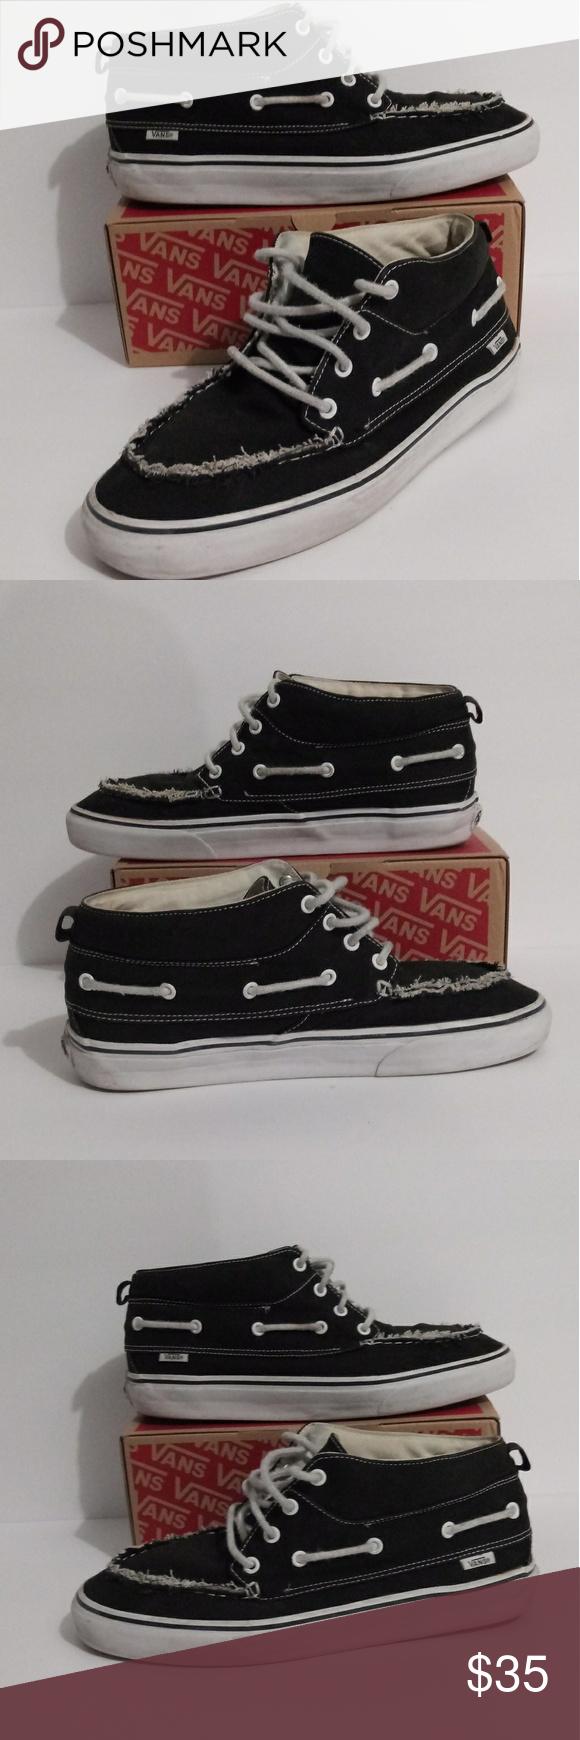 Vans Black Mid Skateboard Shoes Casual Mens 11 Men's Size 11   Vans Black Boat C…